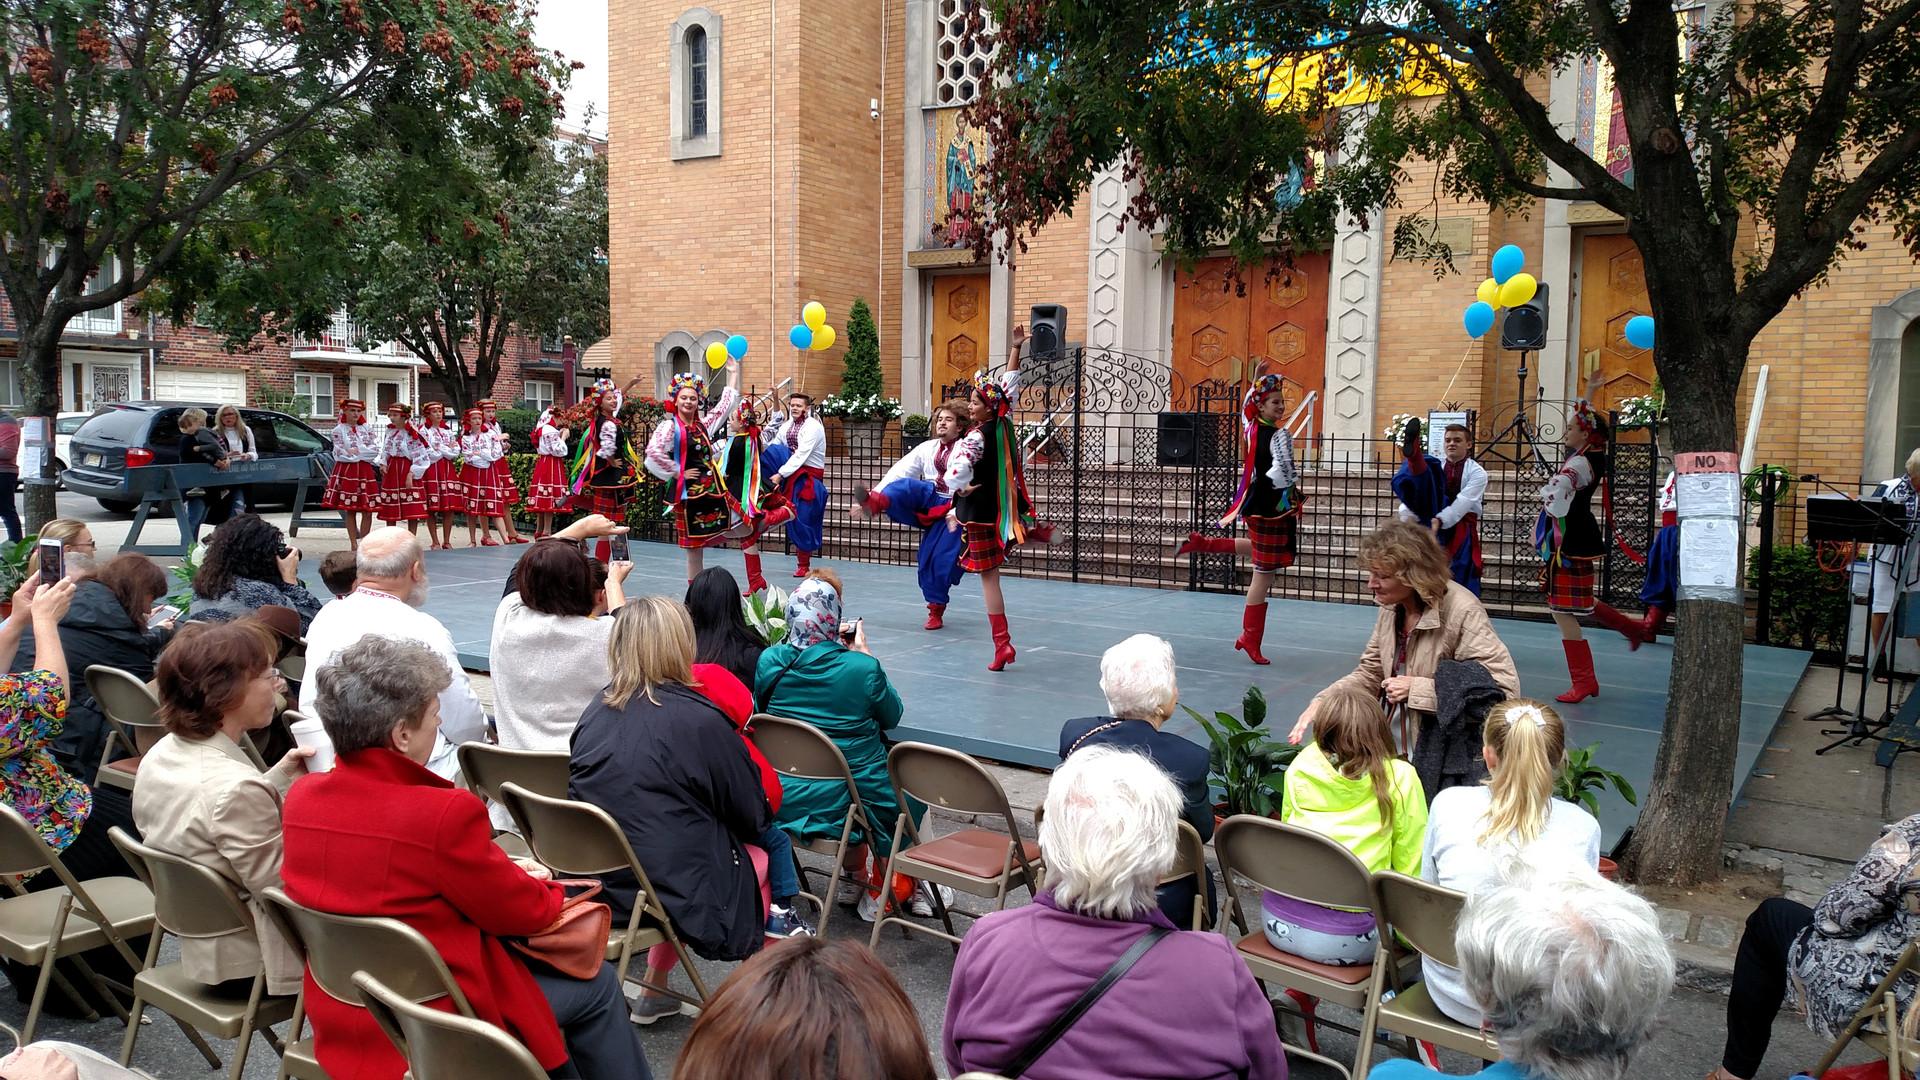 Dancers Entertaining